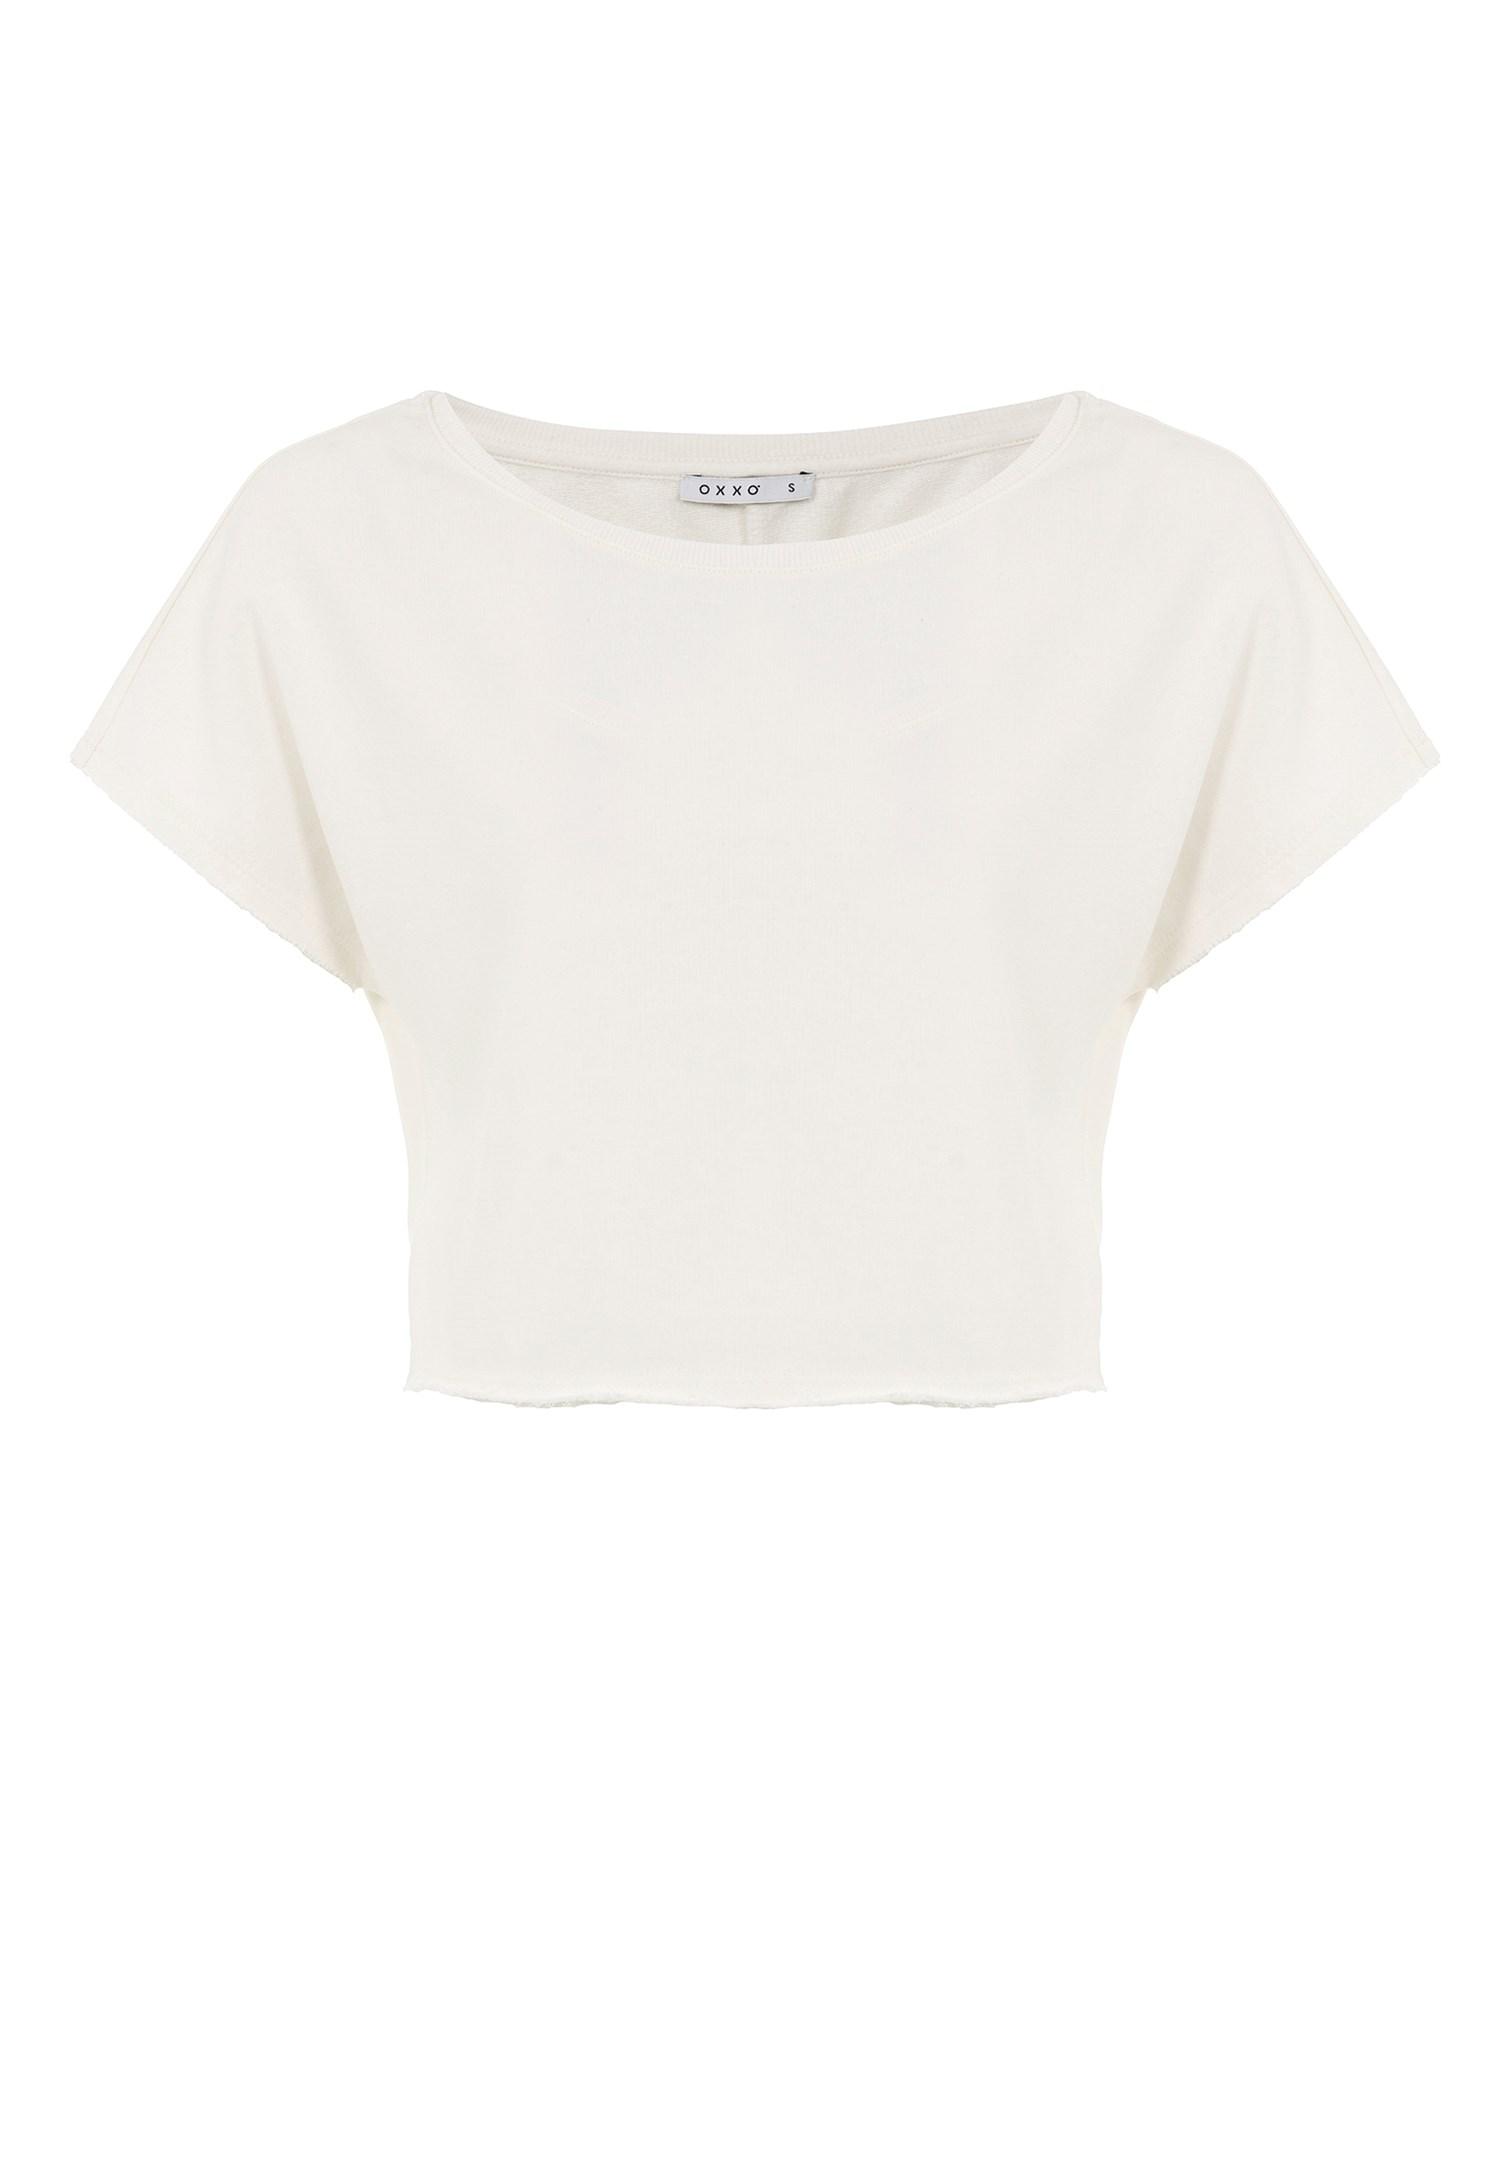 Bayan Krem Kayık Yaka Kısa Sweatshirt